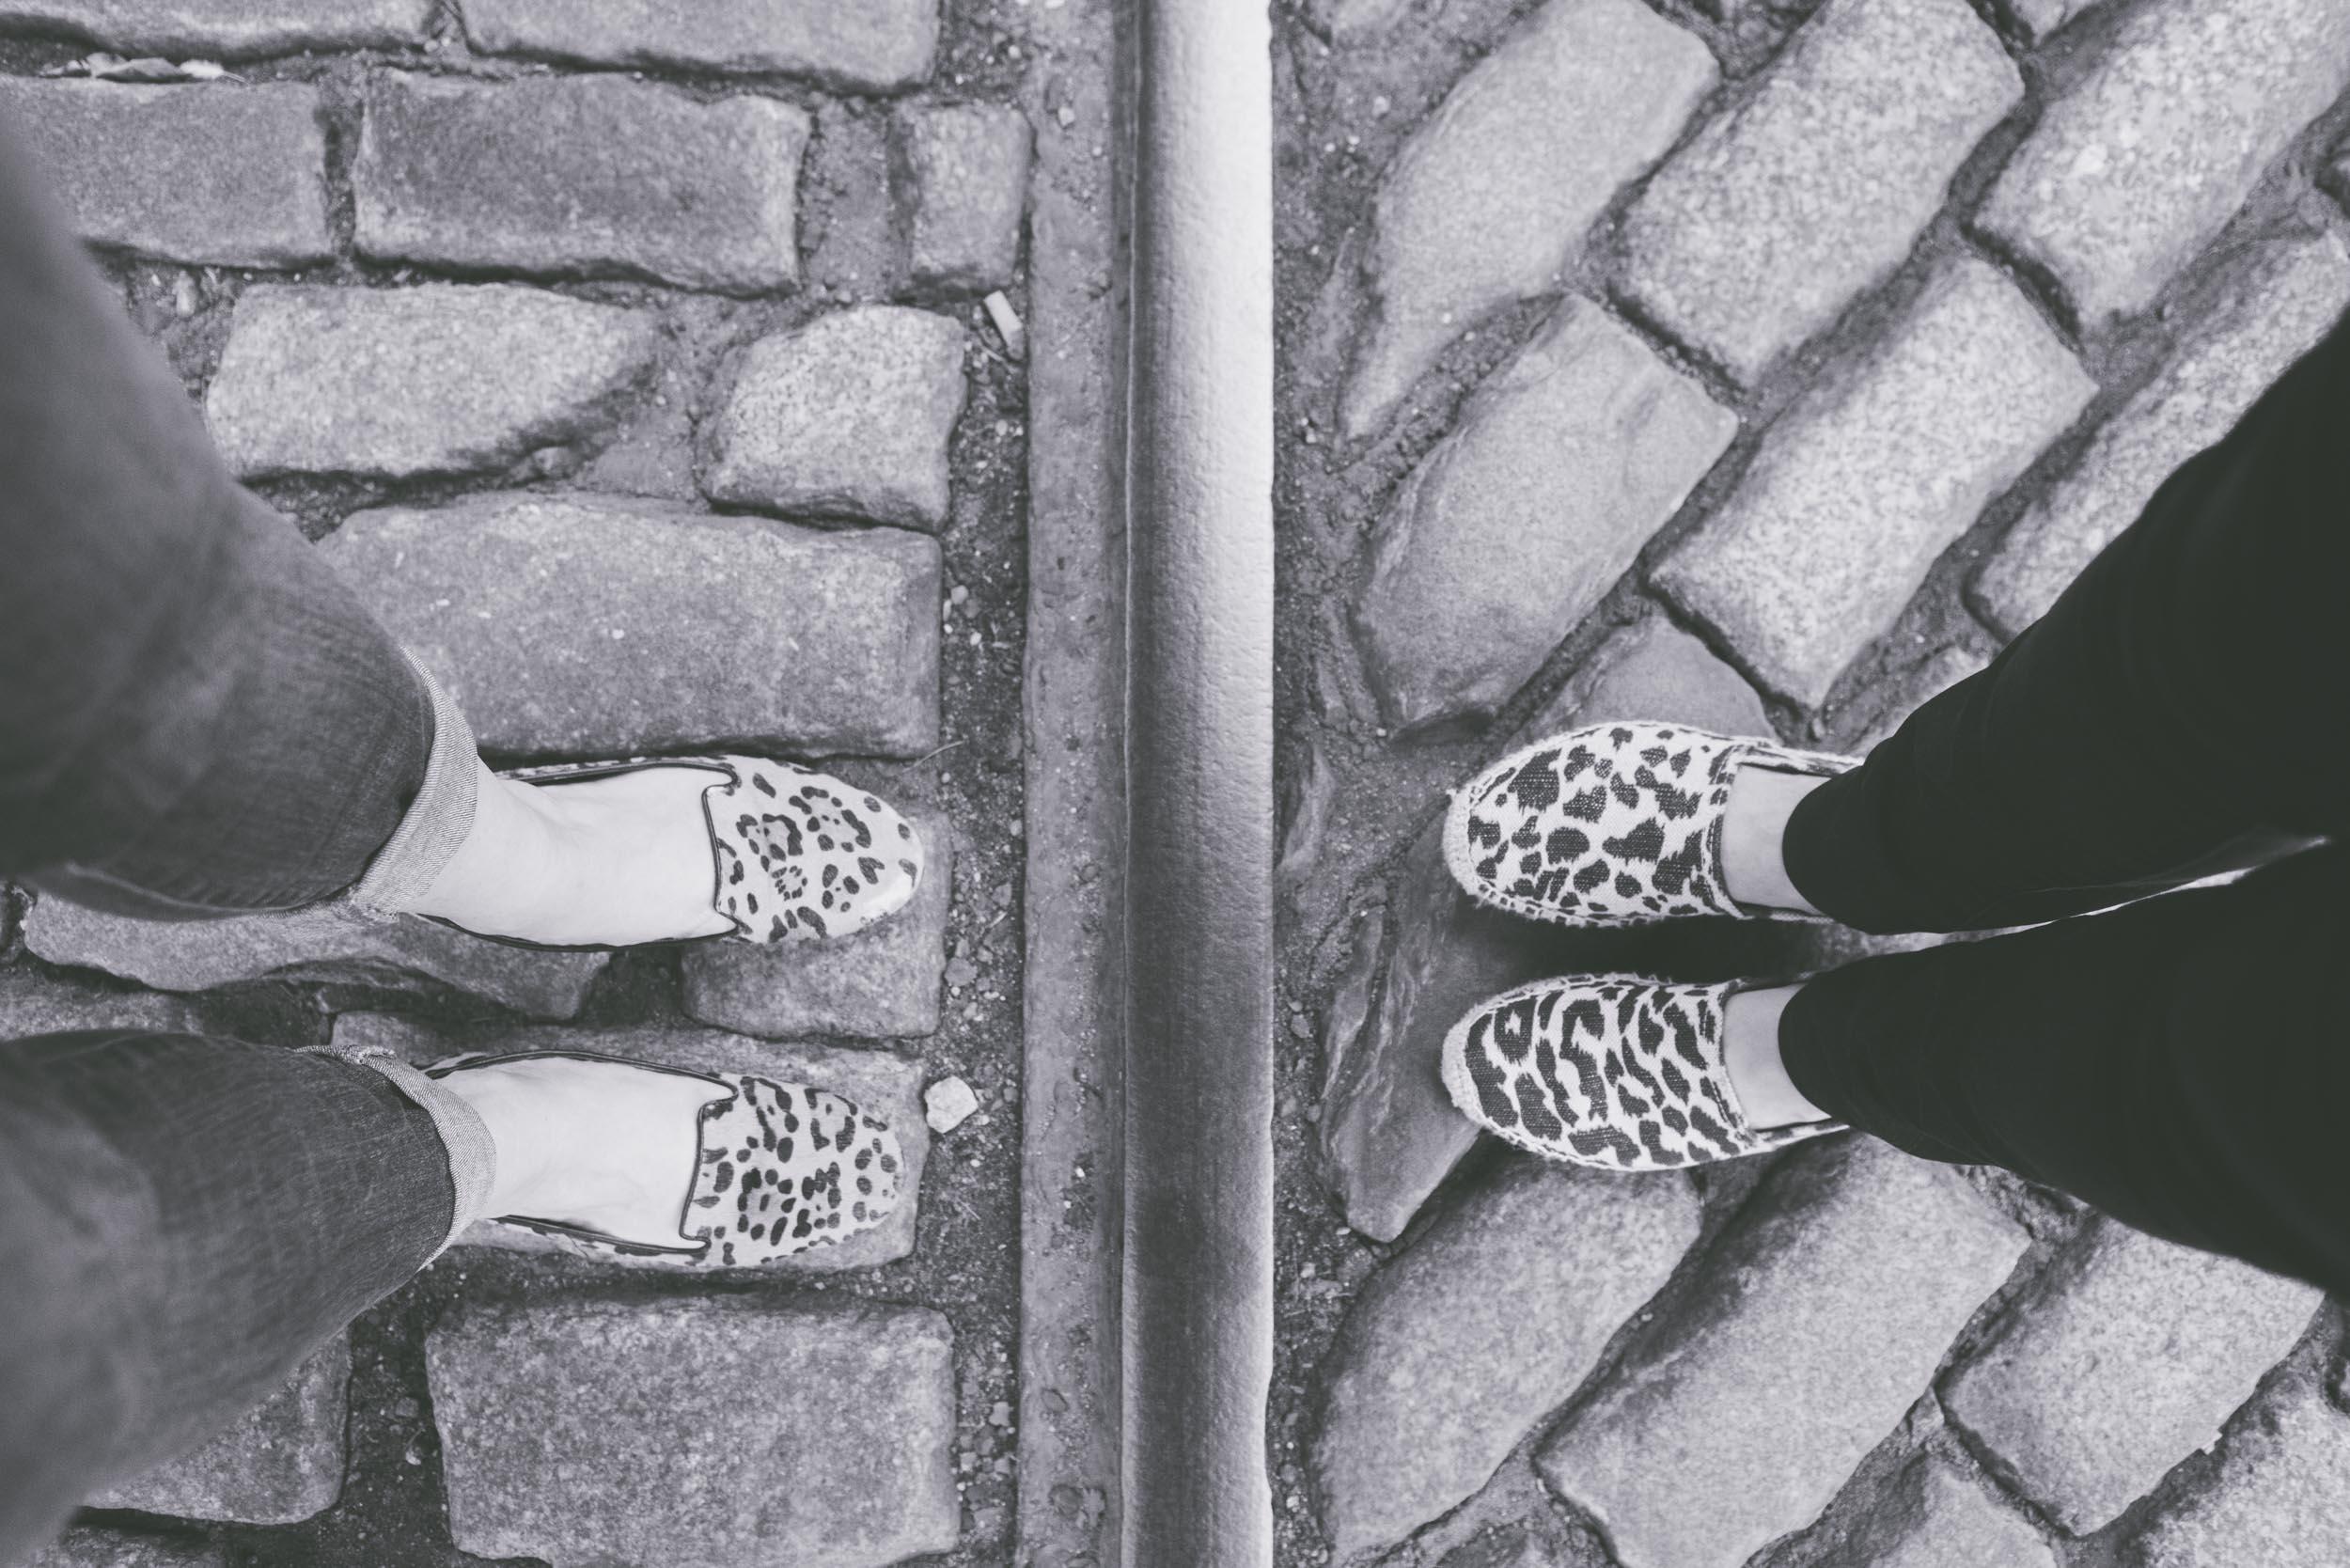 Womens leopard print shoes - Engagement Portraits - Photo credit Nicola Bailey.jpg